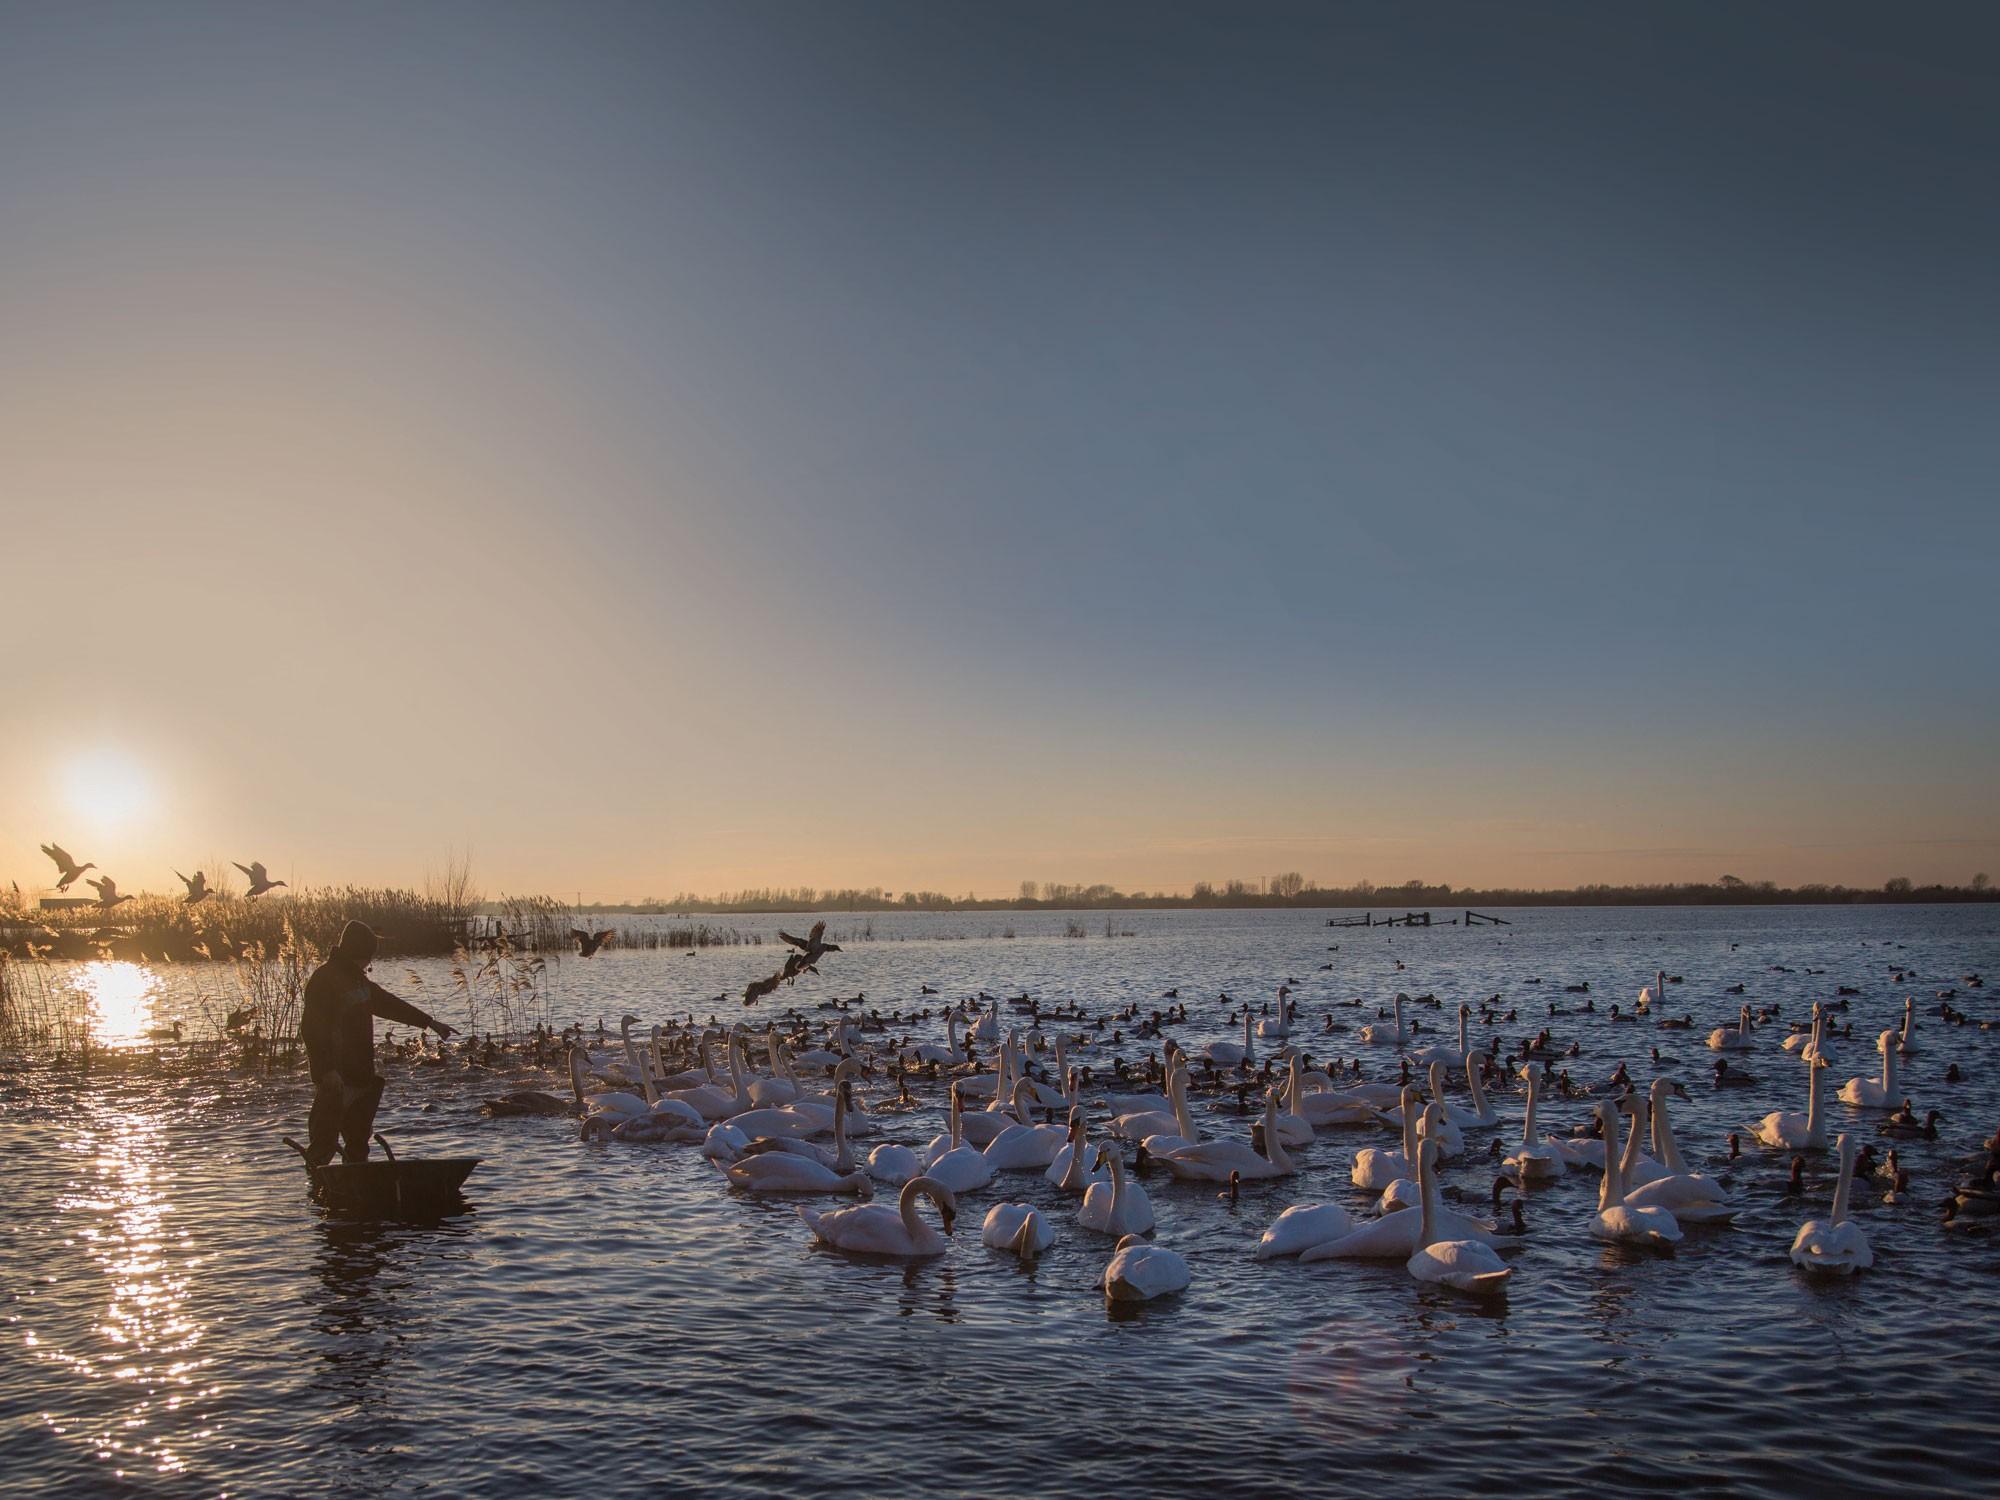 Welney Swan feeding